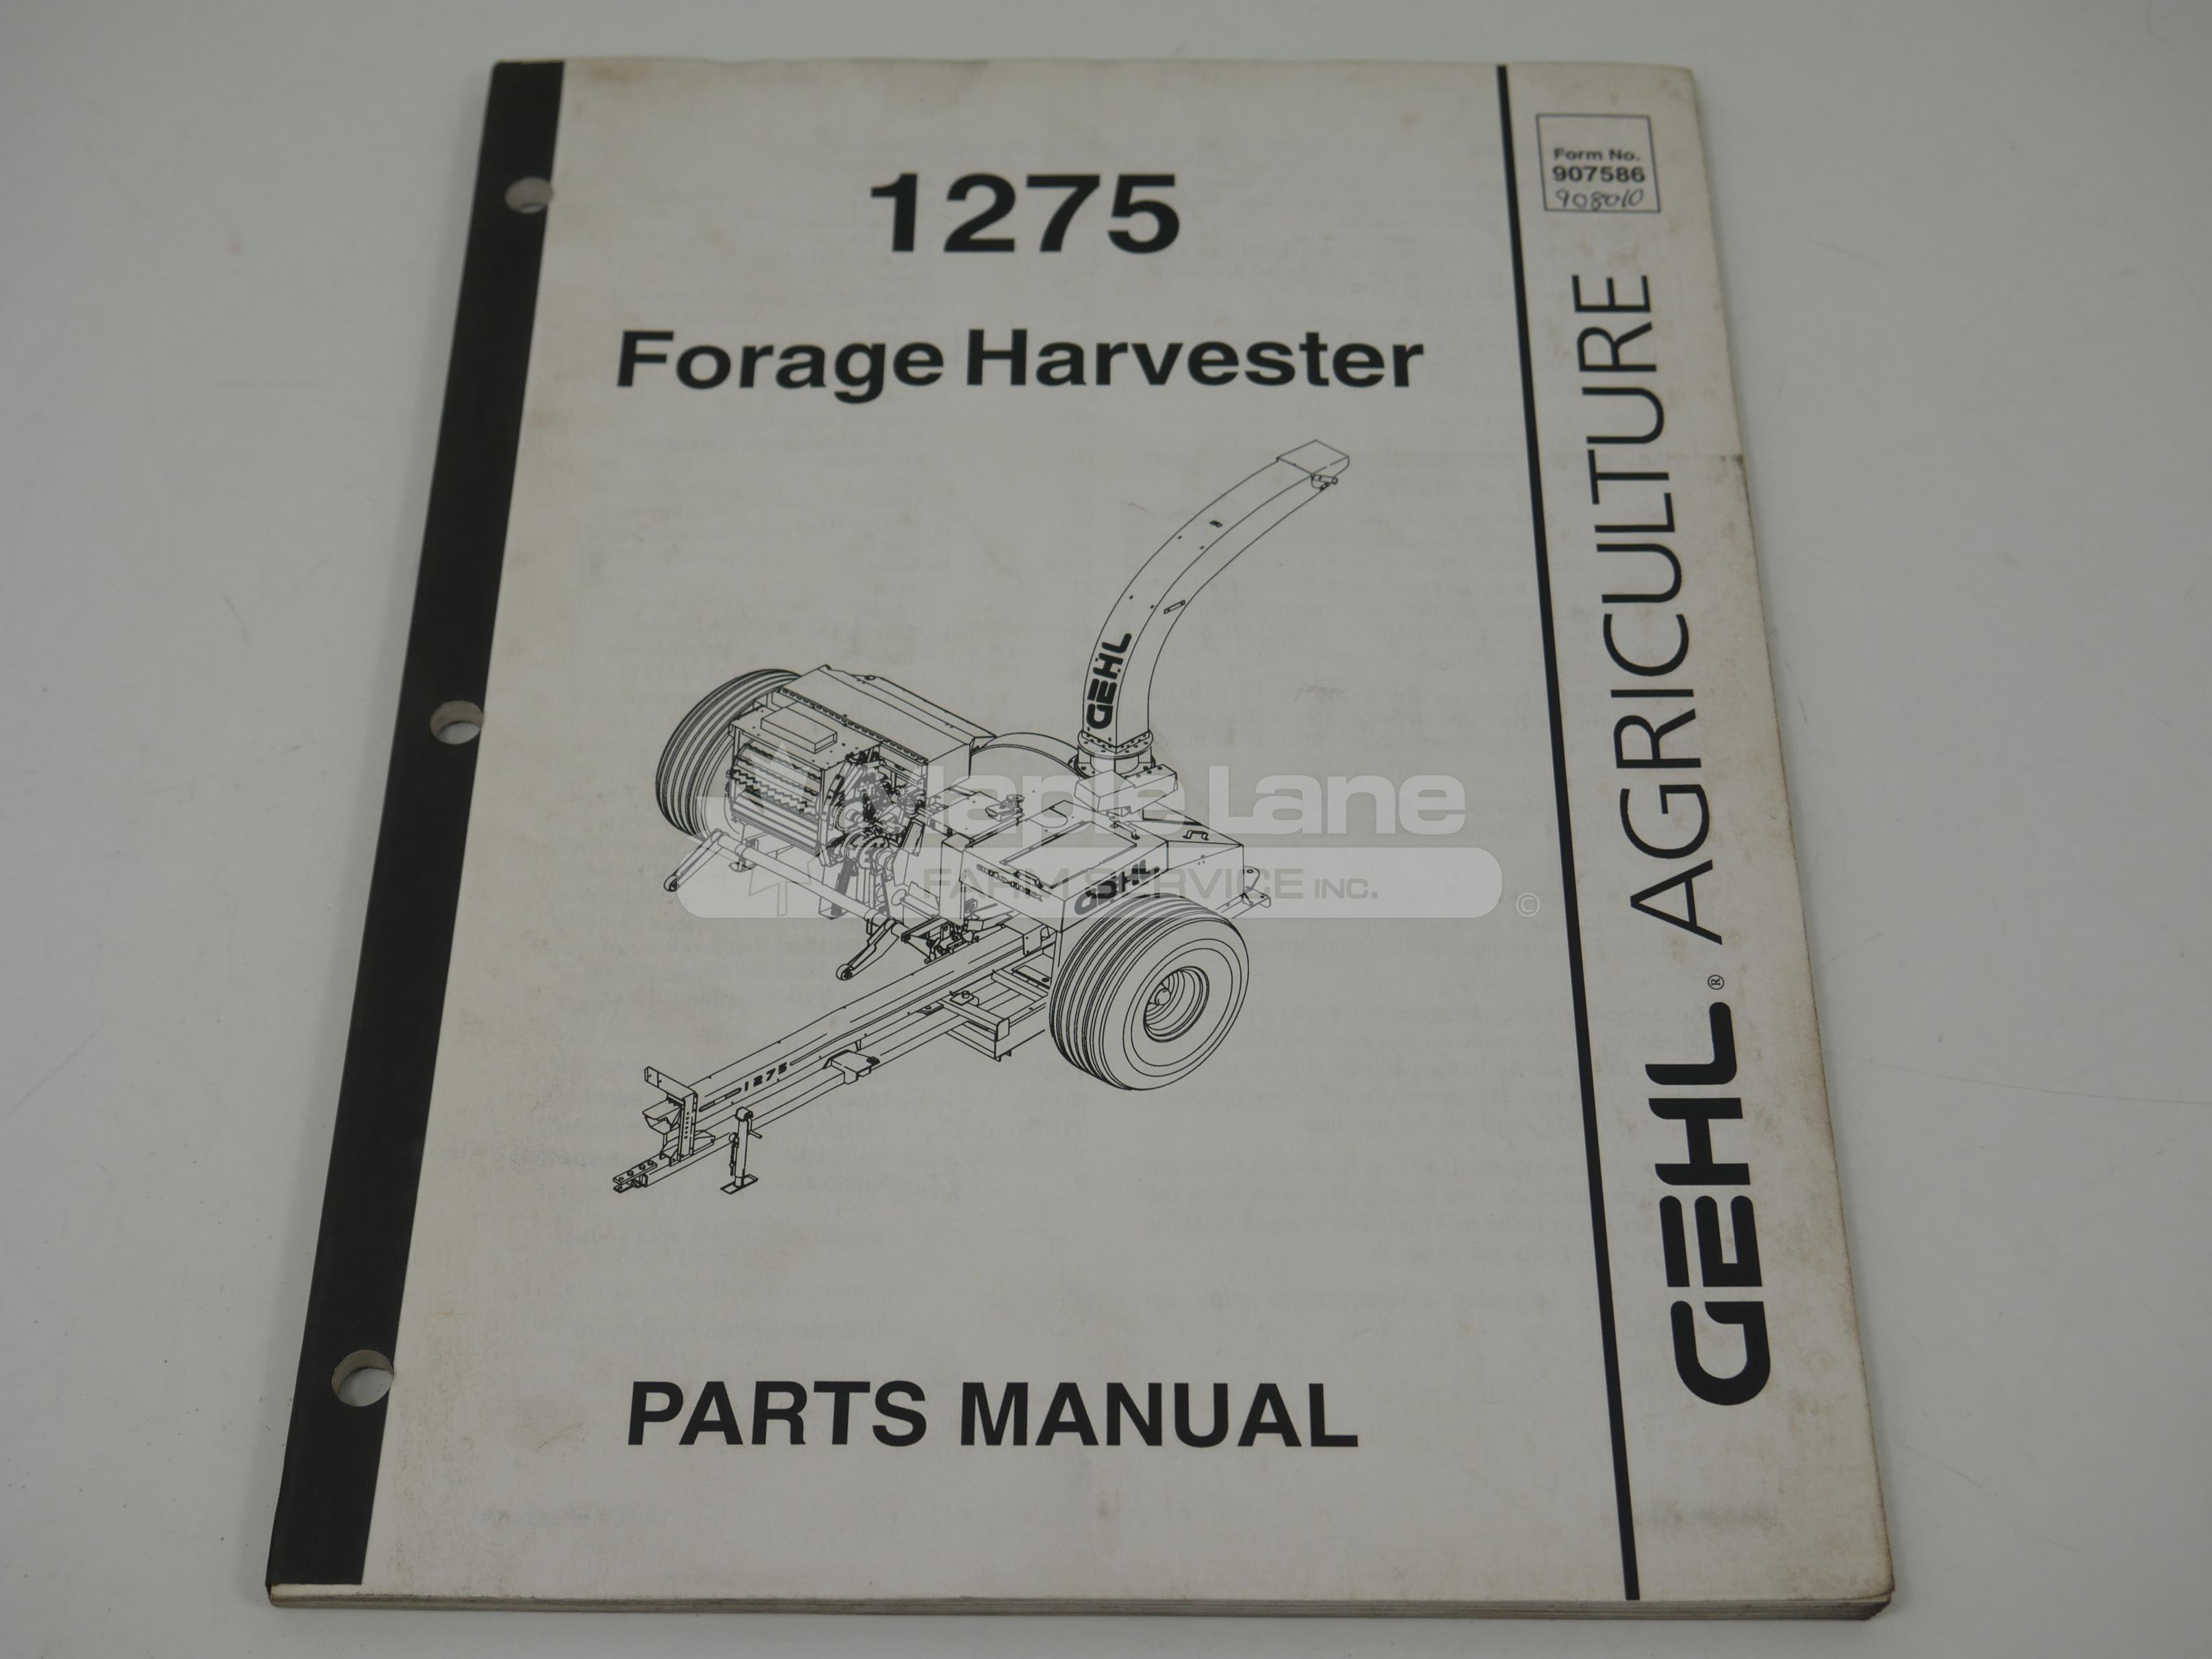 908010 1275 Parts Manual